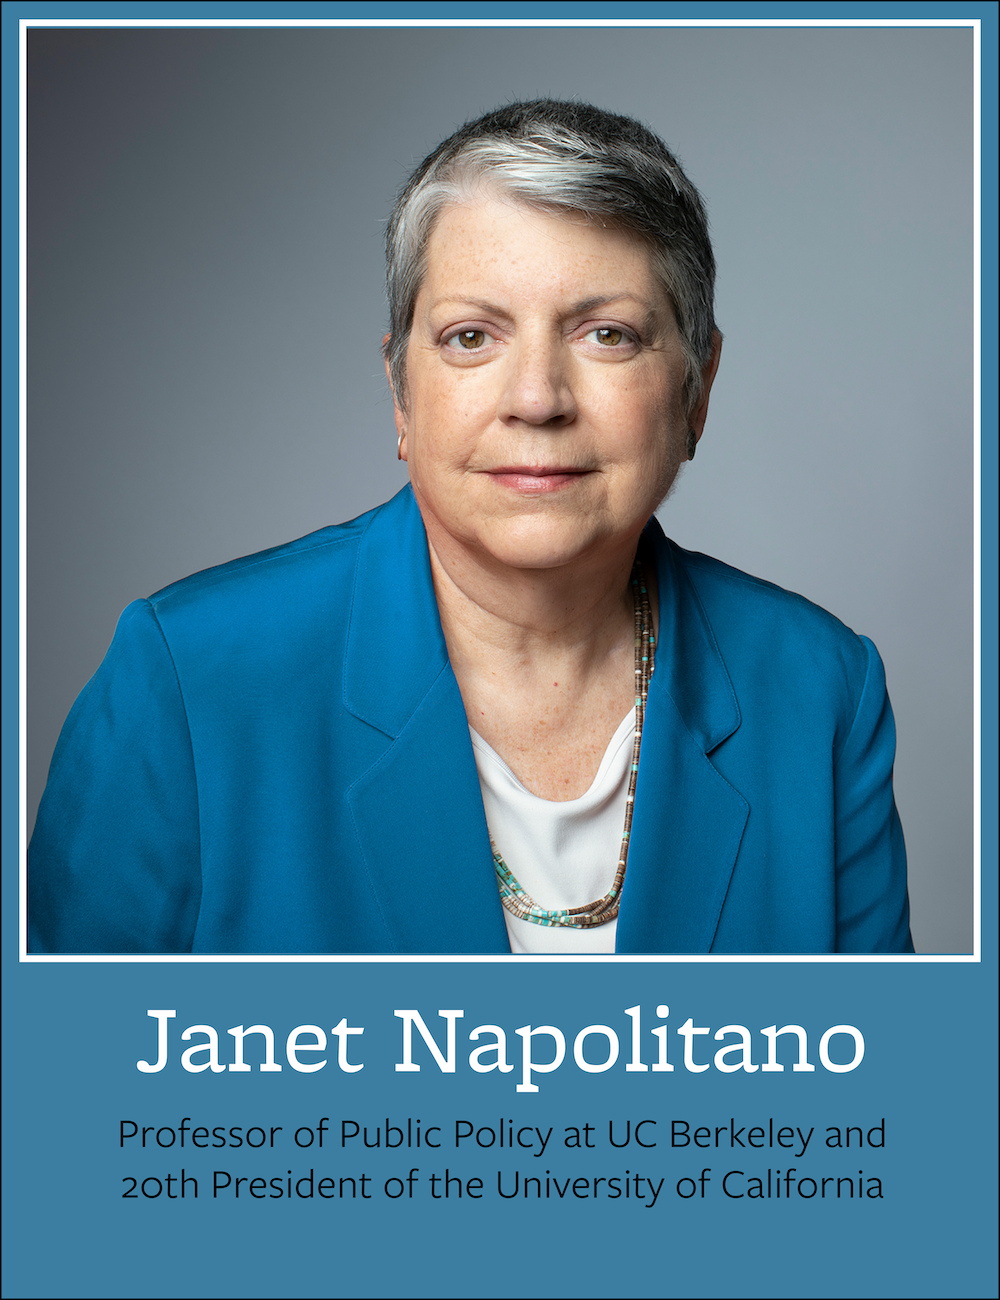 Janet Napolitano Headshot